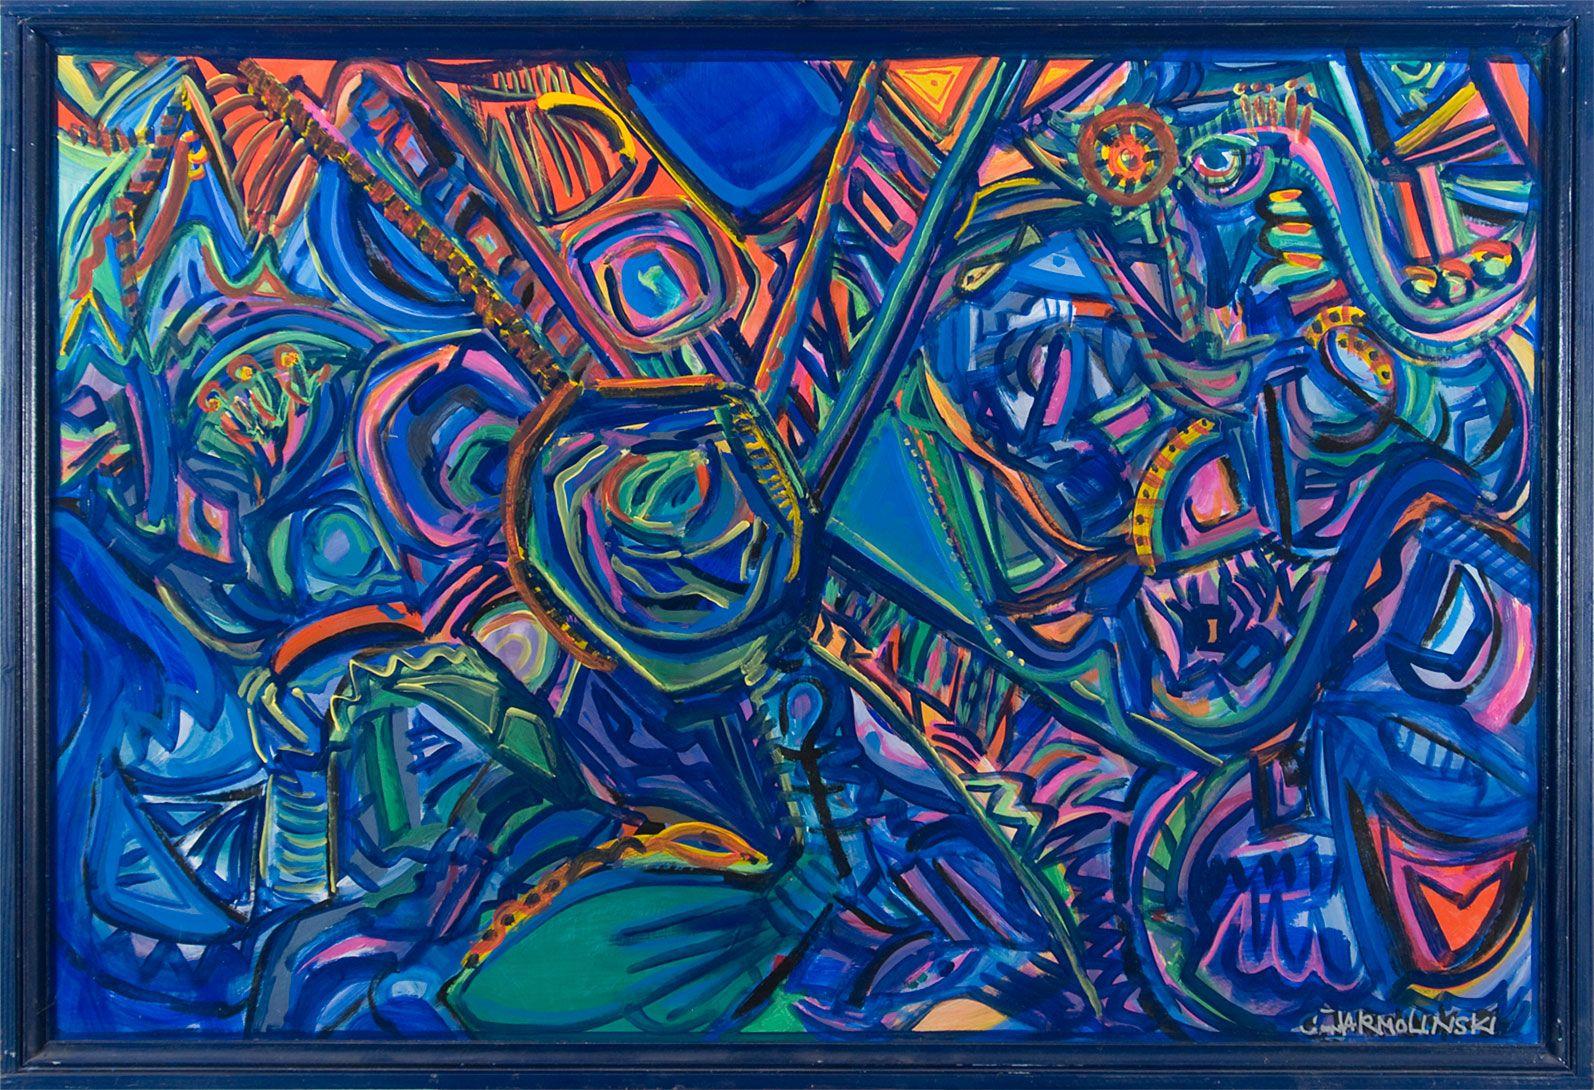 Form Definition In Art : Unity art examples pixshark images galleries